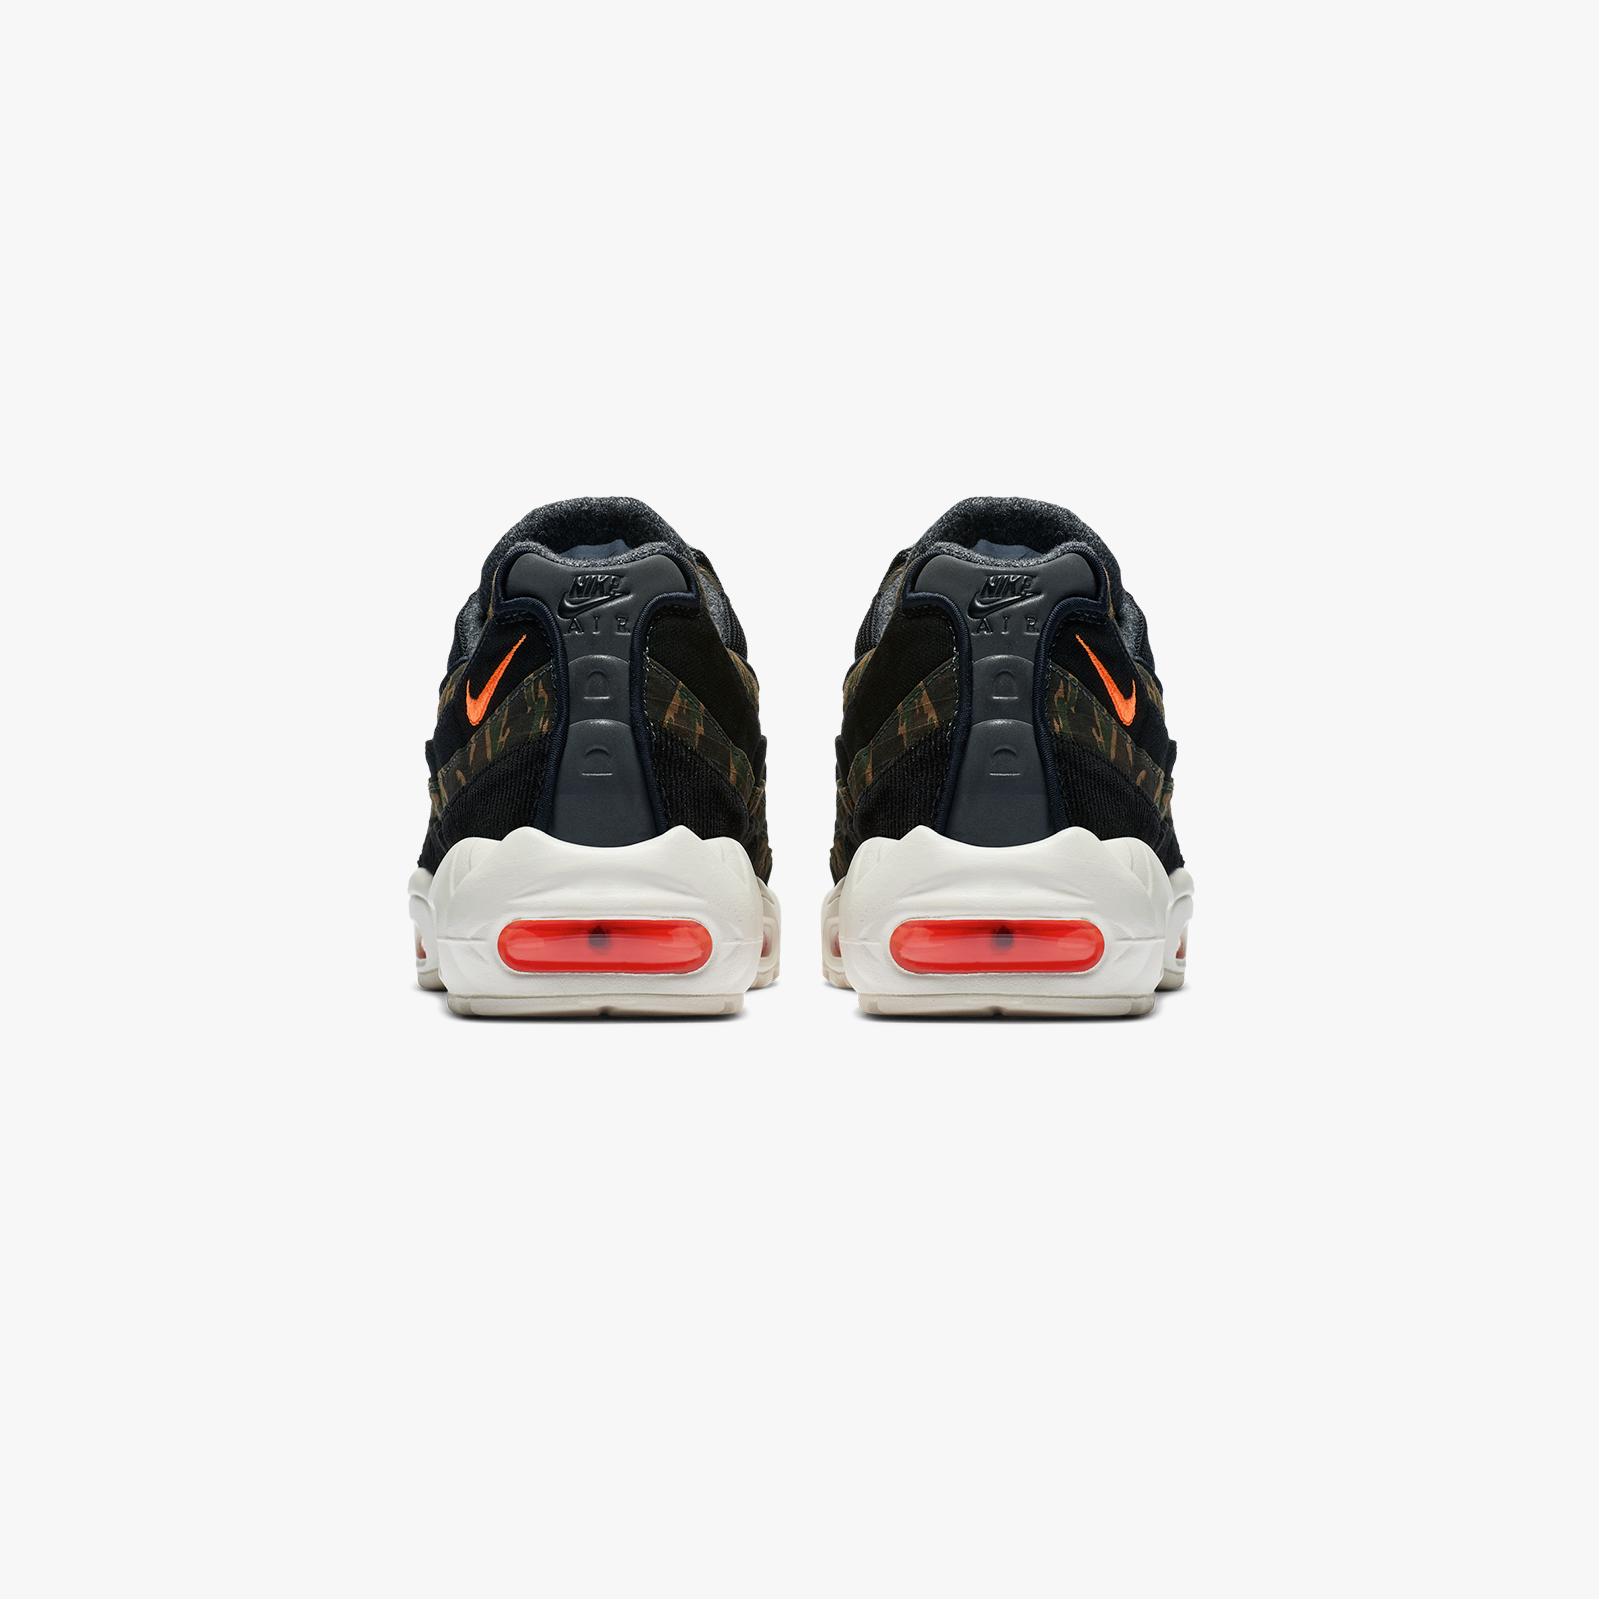 Nike Air Max 95 x Carhartt WIP - Av3866-001 - Sneakersnstuff ... f82021b13